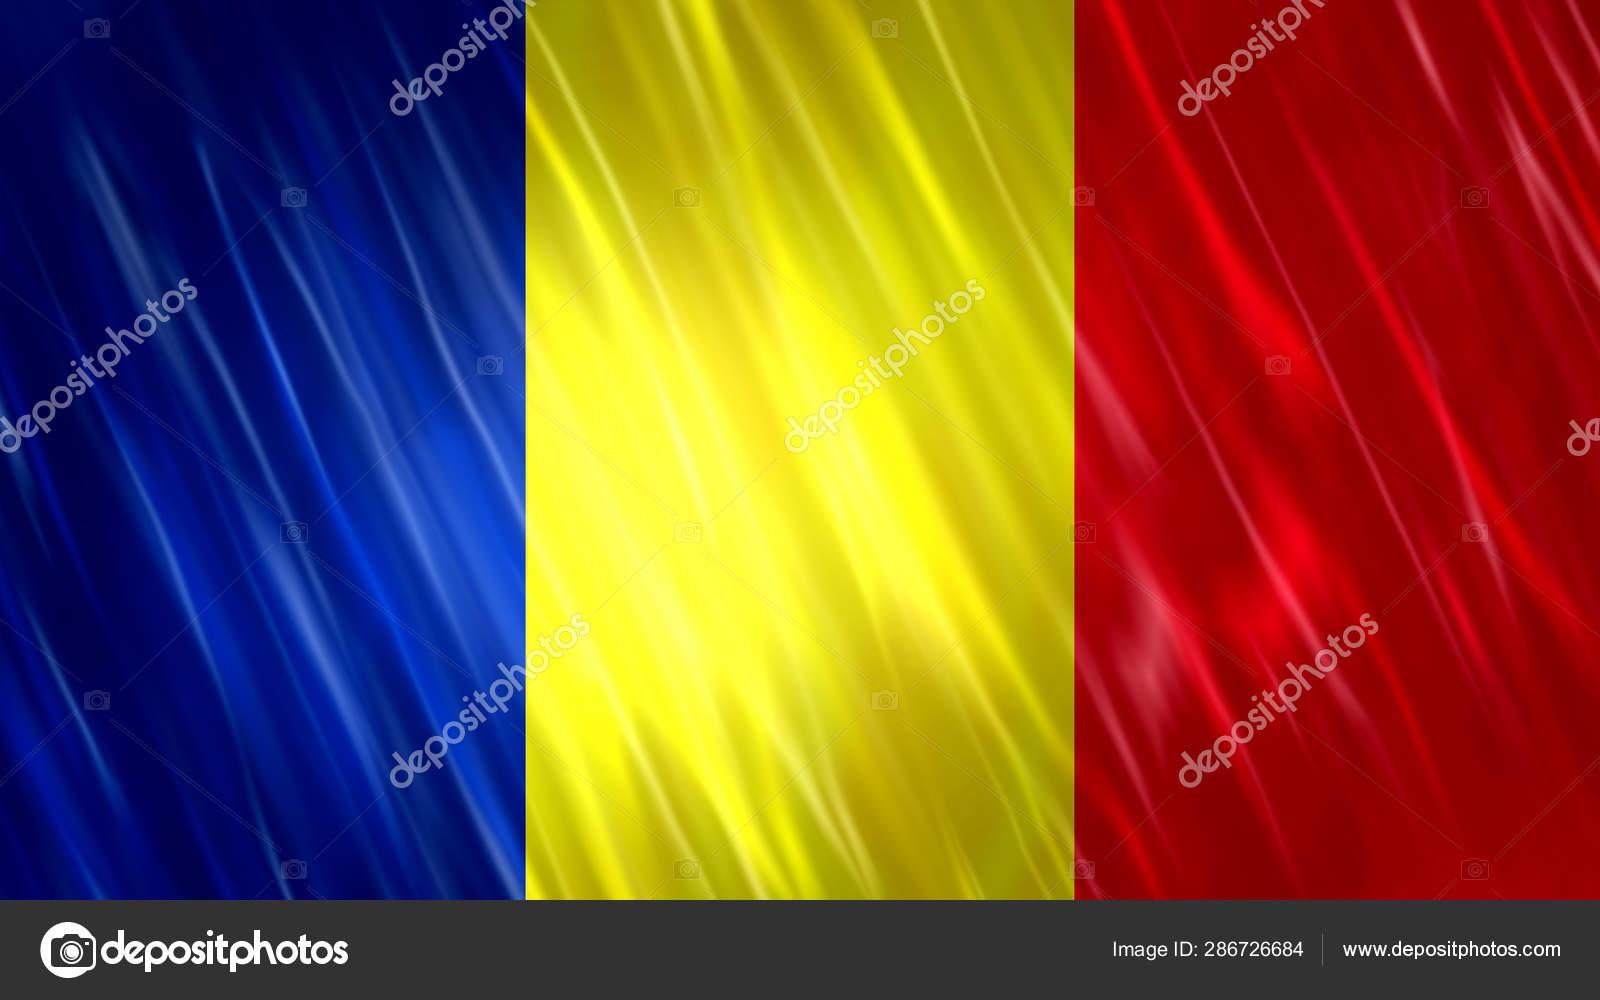 Romania Flag Print Wallpaper Purposes Size 7680 Width 4320